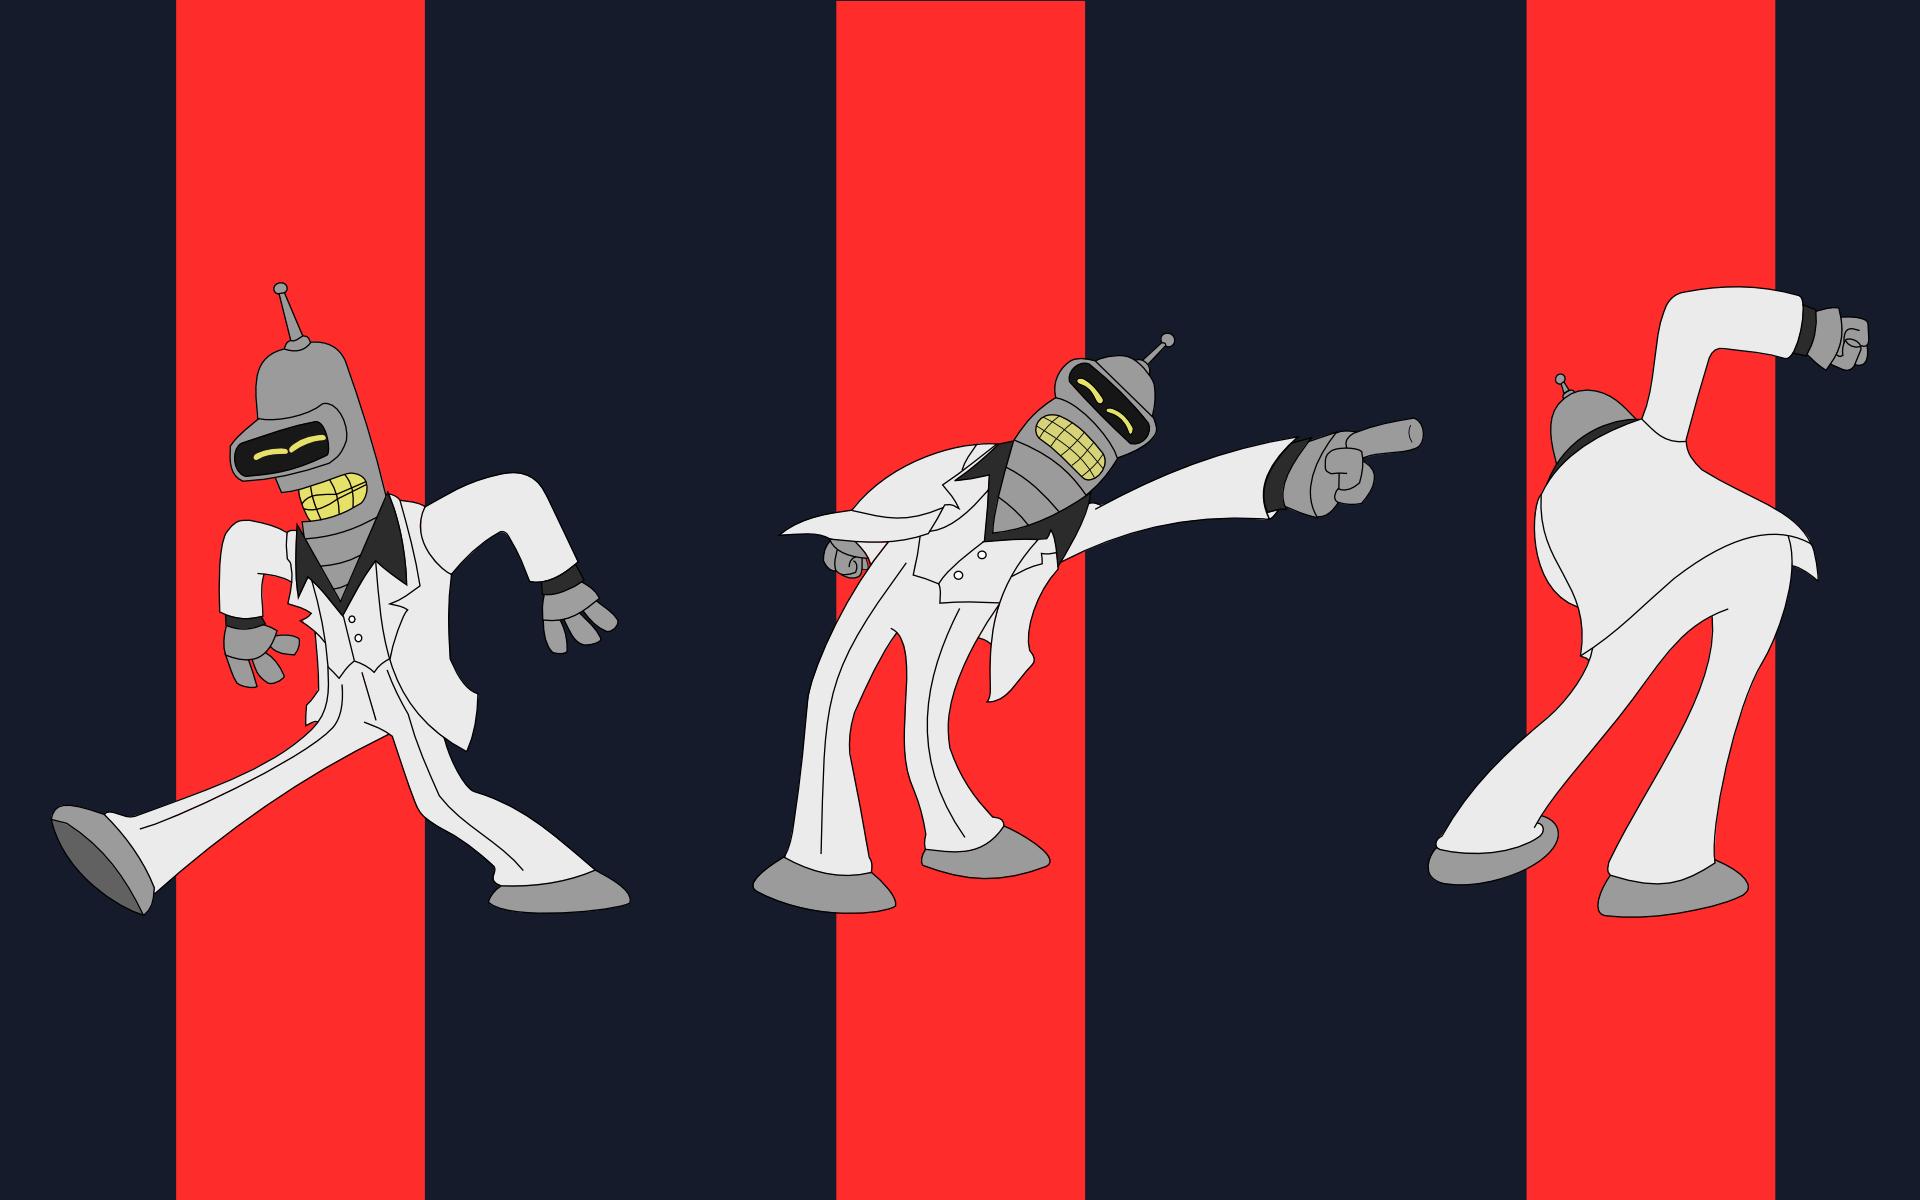 Do The Bender Wallpaper by Sgtconker1r